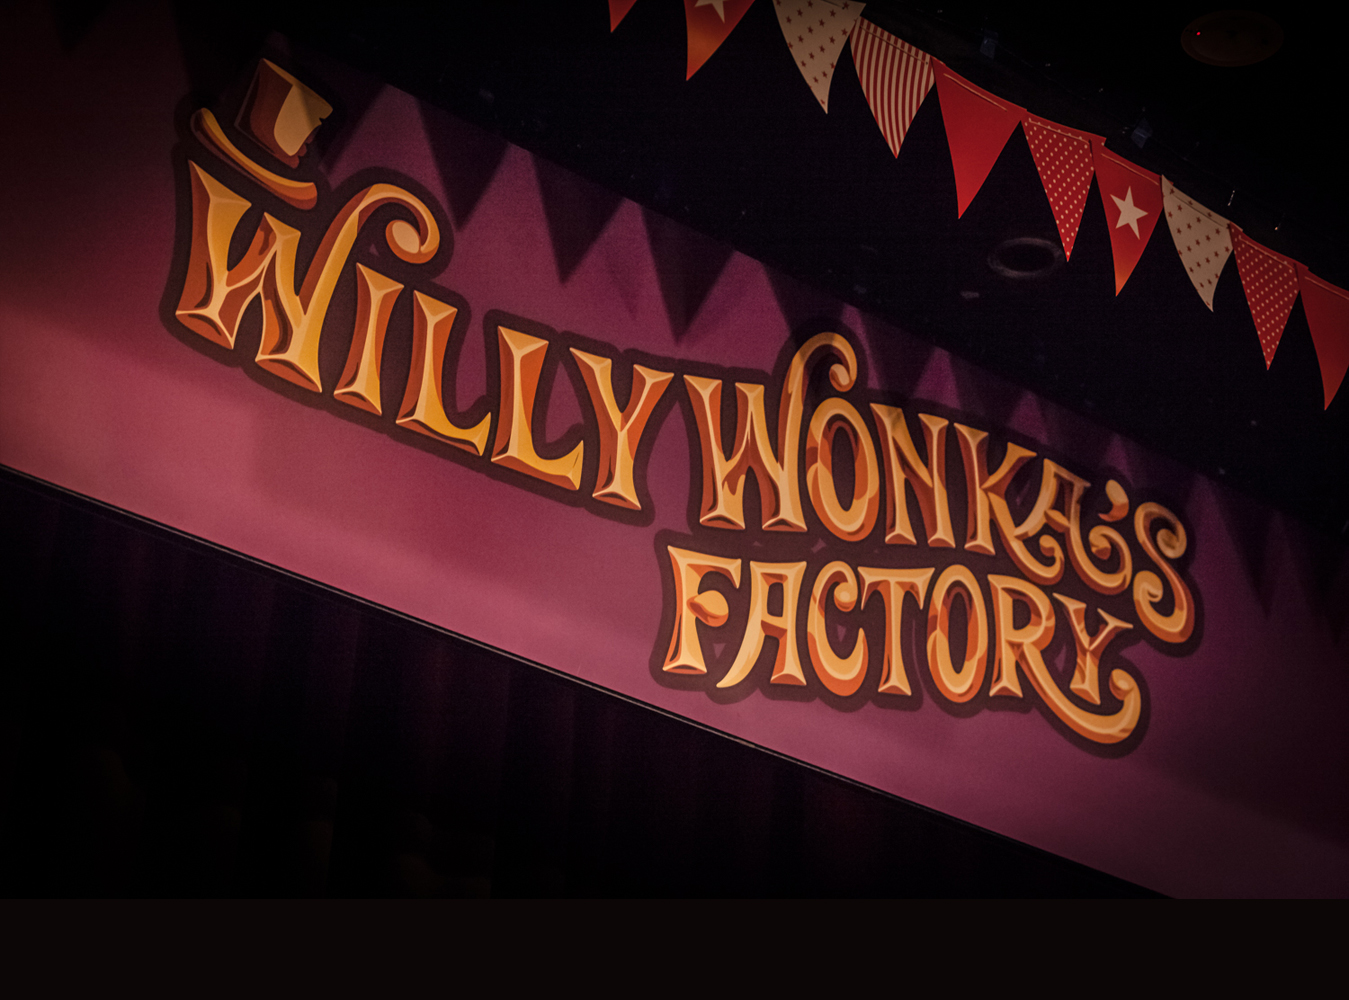 WillyWonka banner